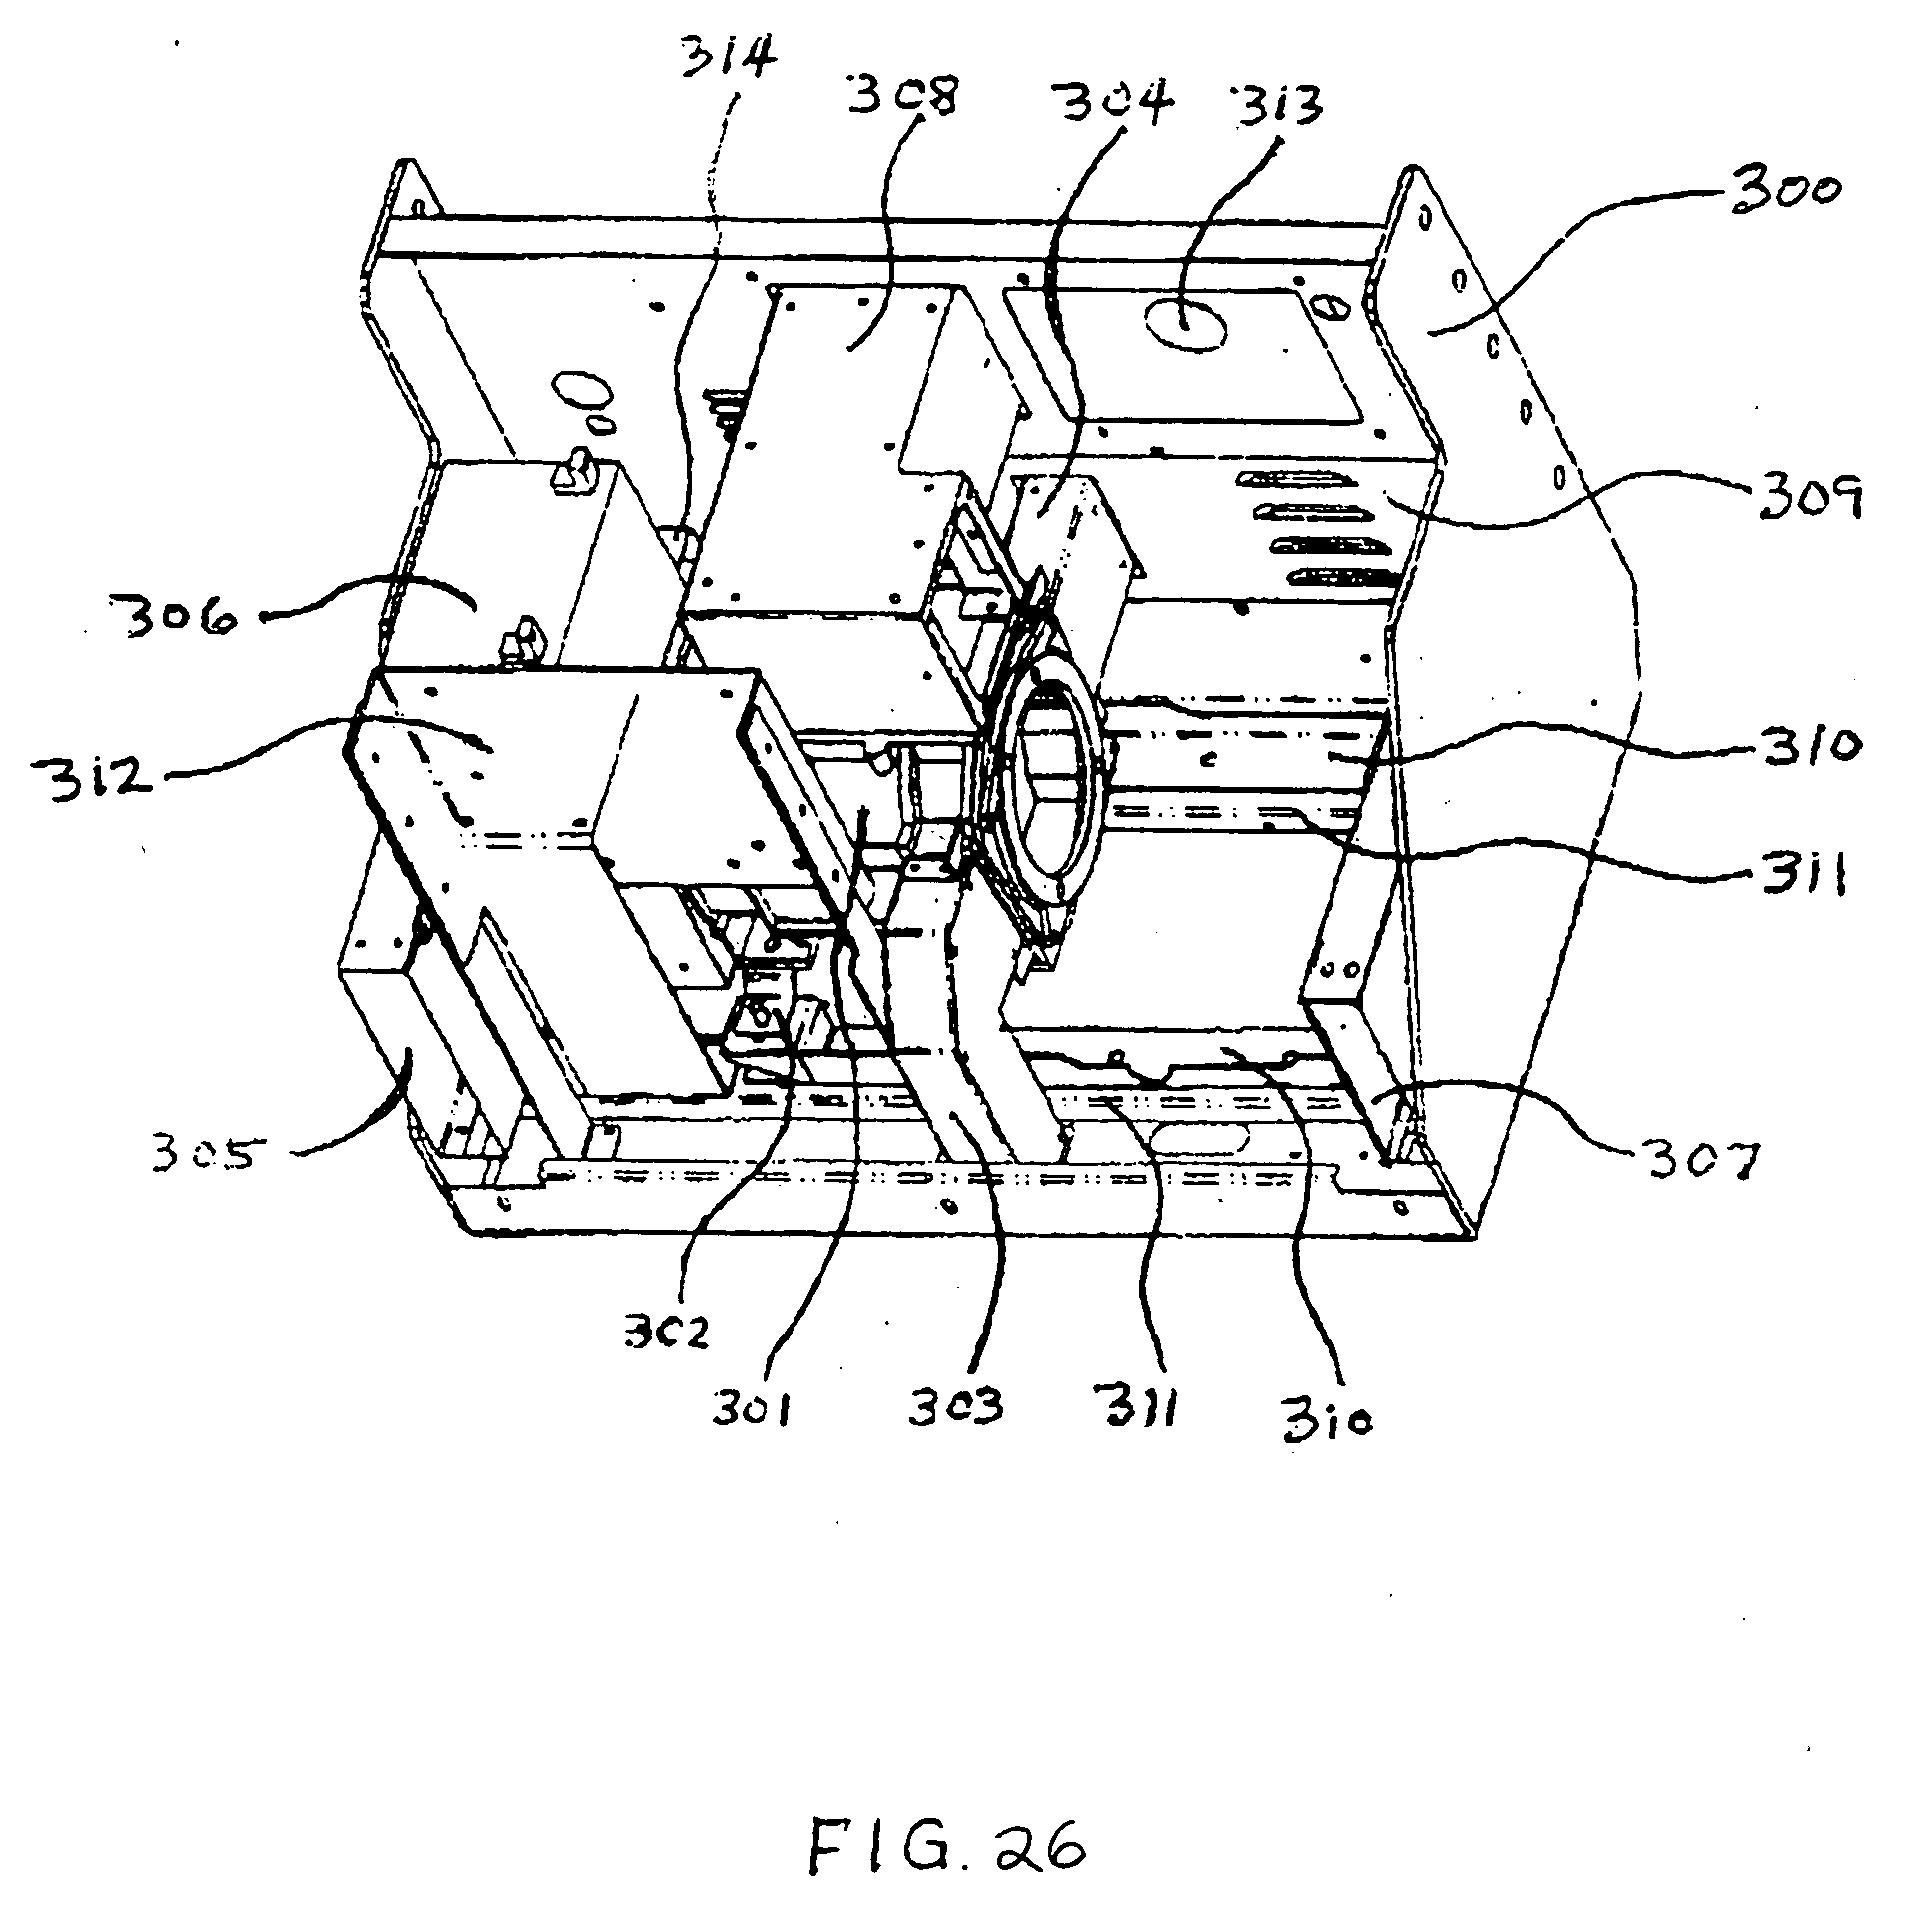 hight resolution of thermo king tripac wiring diagram tripac apu wiring diagram